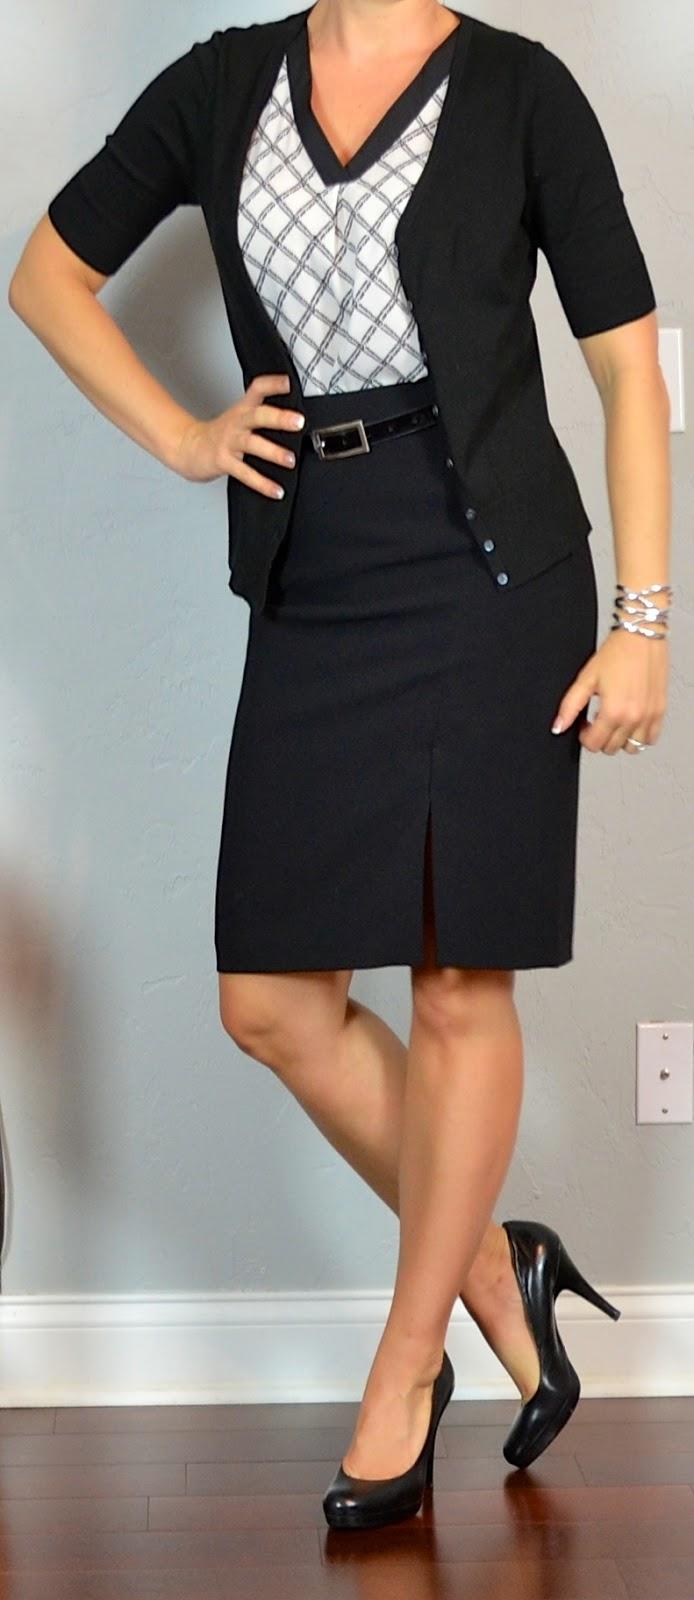 Outfit post black pencil skirt black u0026 white print blouse black cardigan black pumps ...